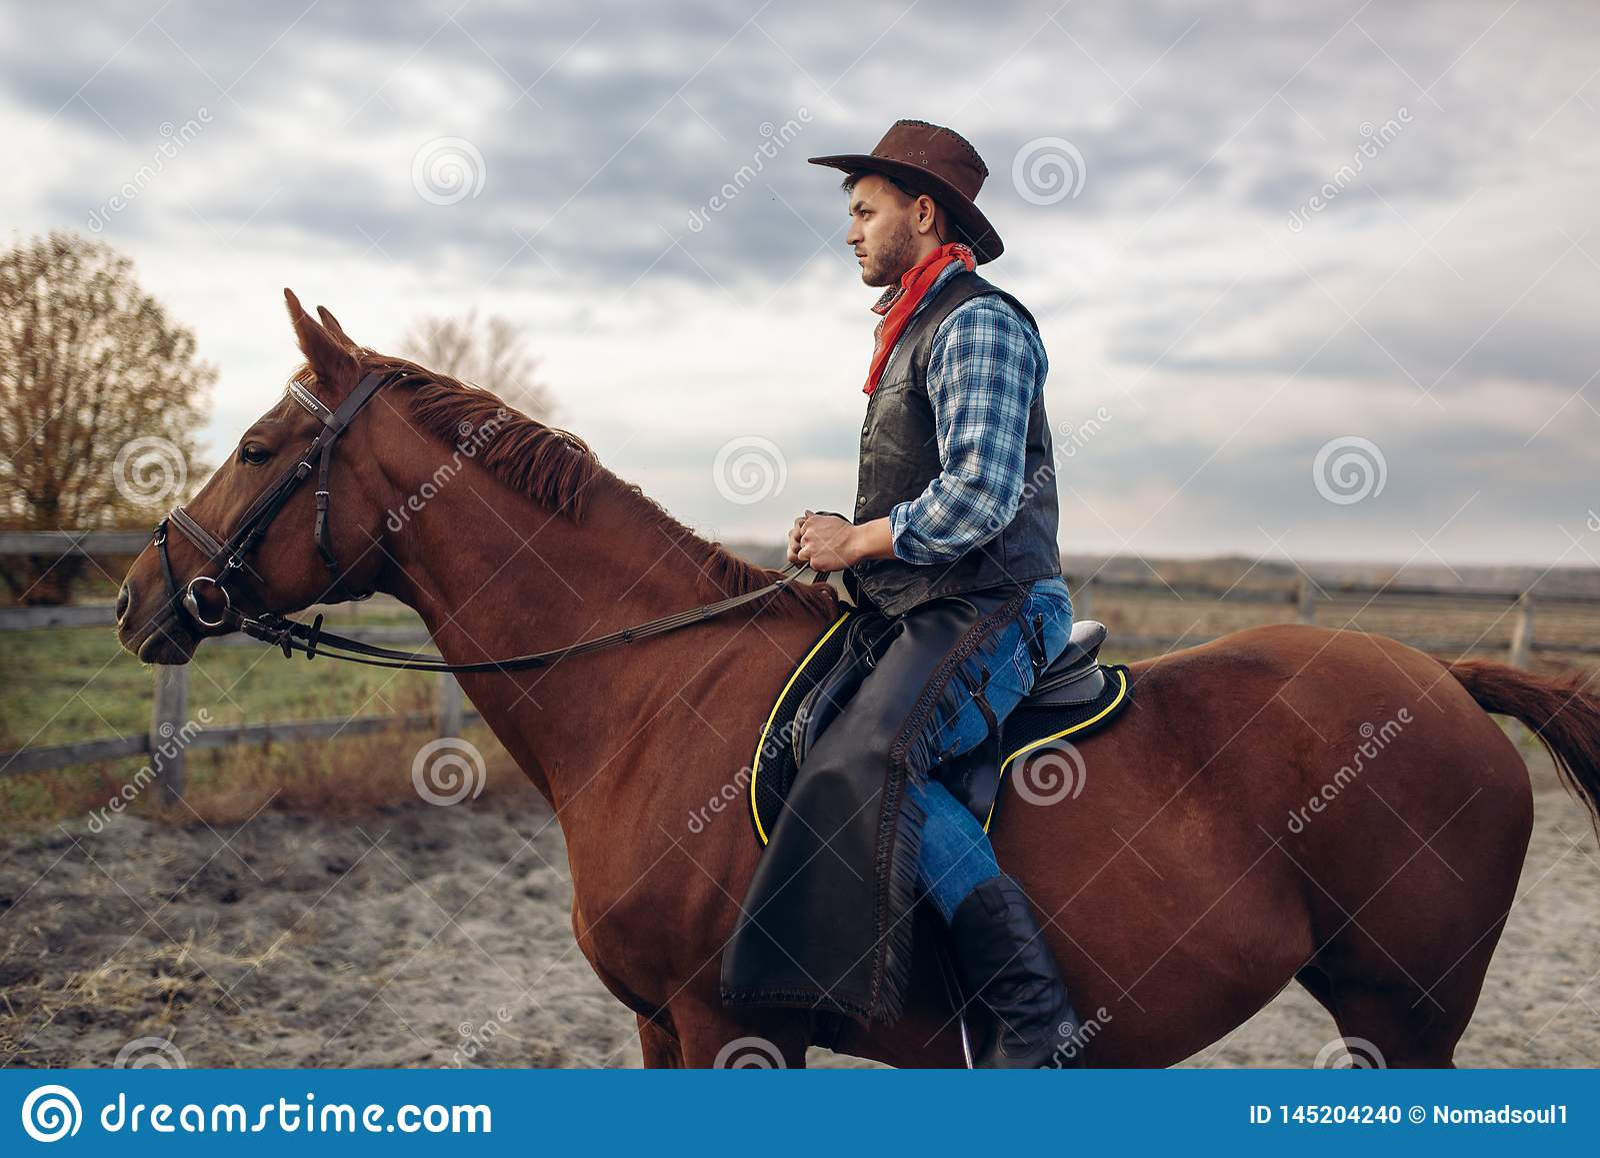 Cowboy Riding A Horse On Texas Farm Stock Photo Image Of Rider Nature 145204240